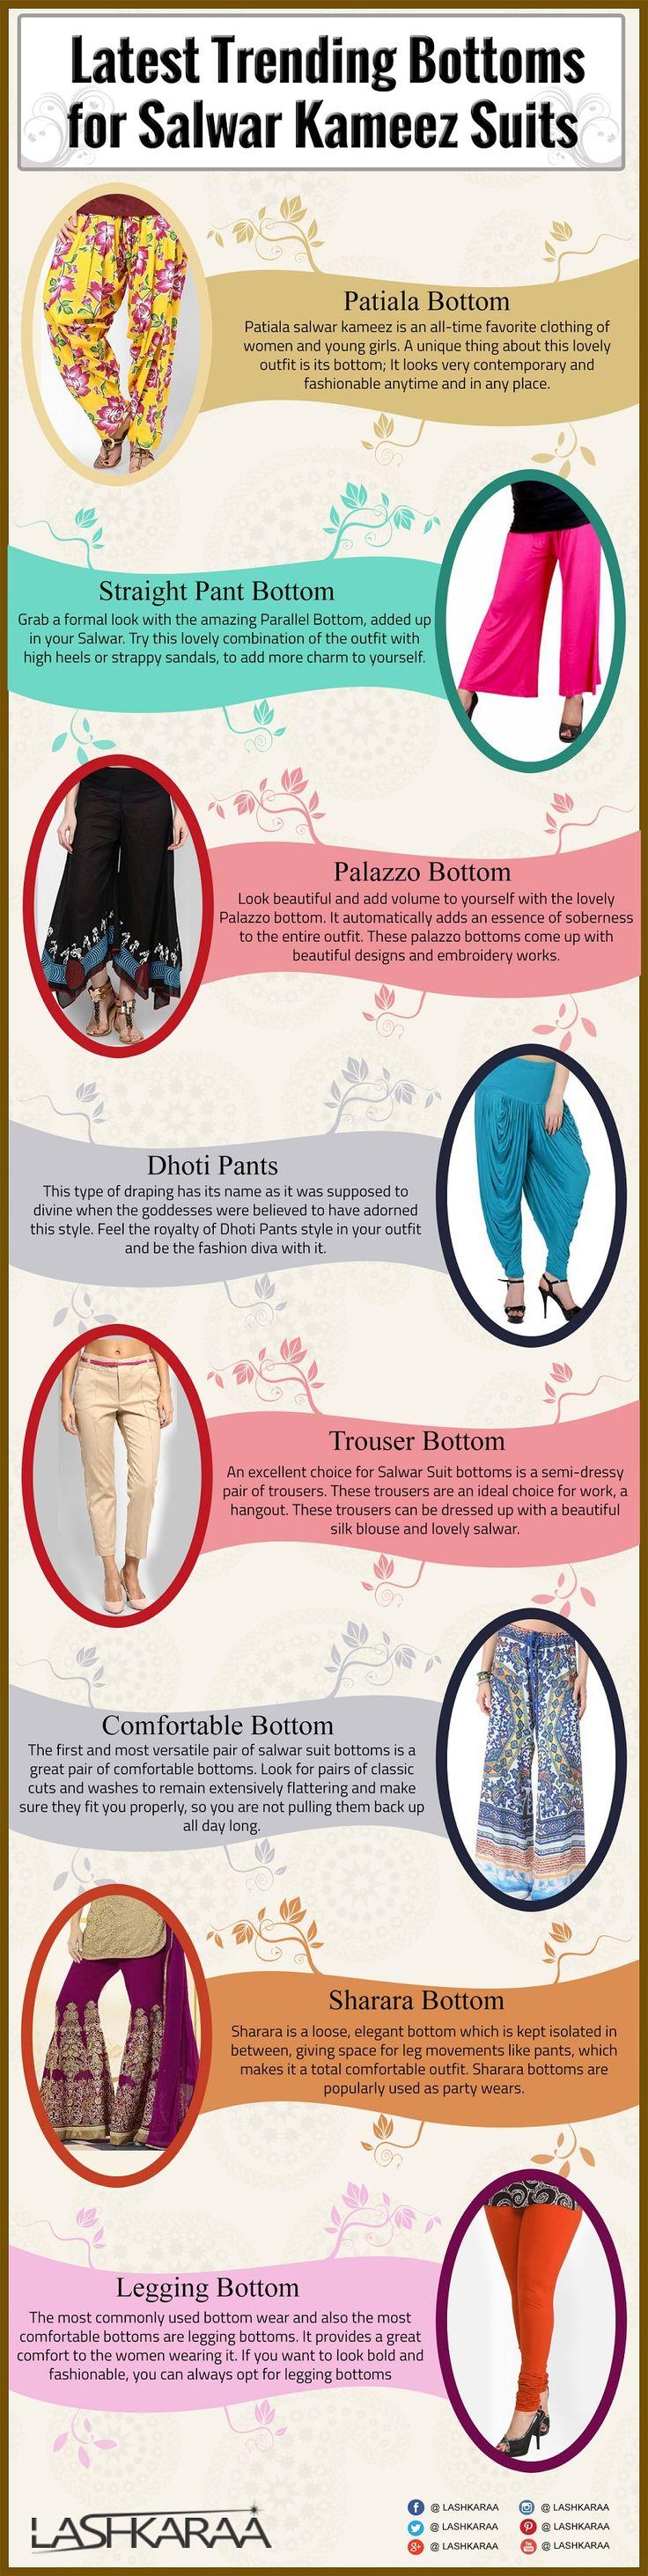 bottoms for kurti or kameez